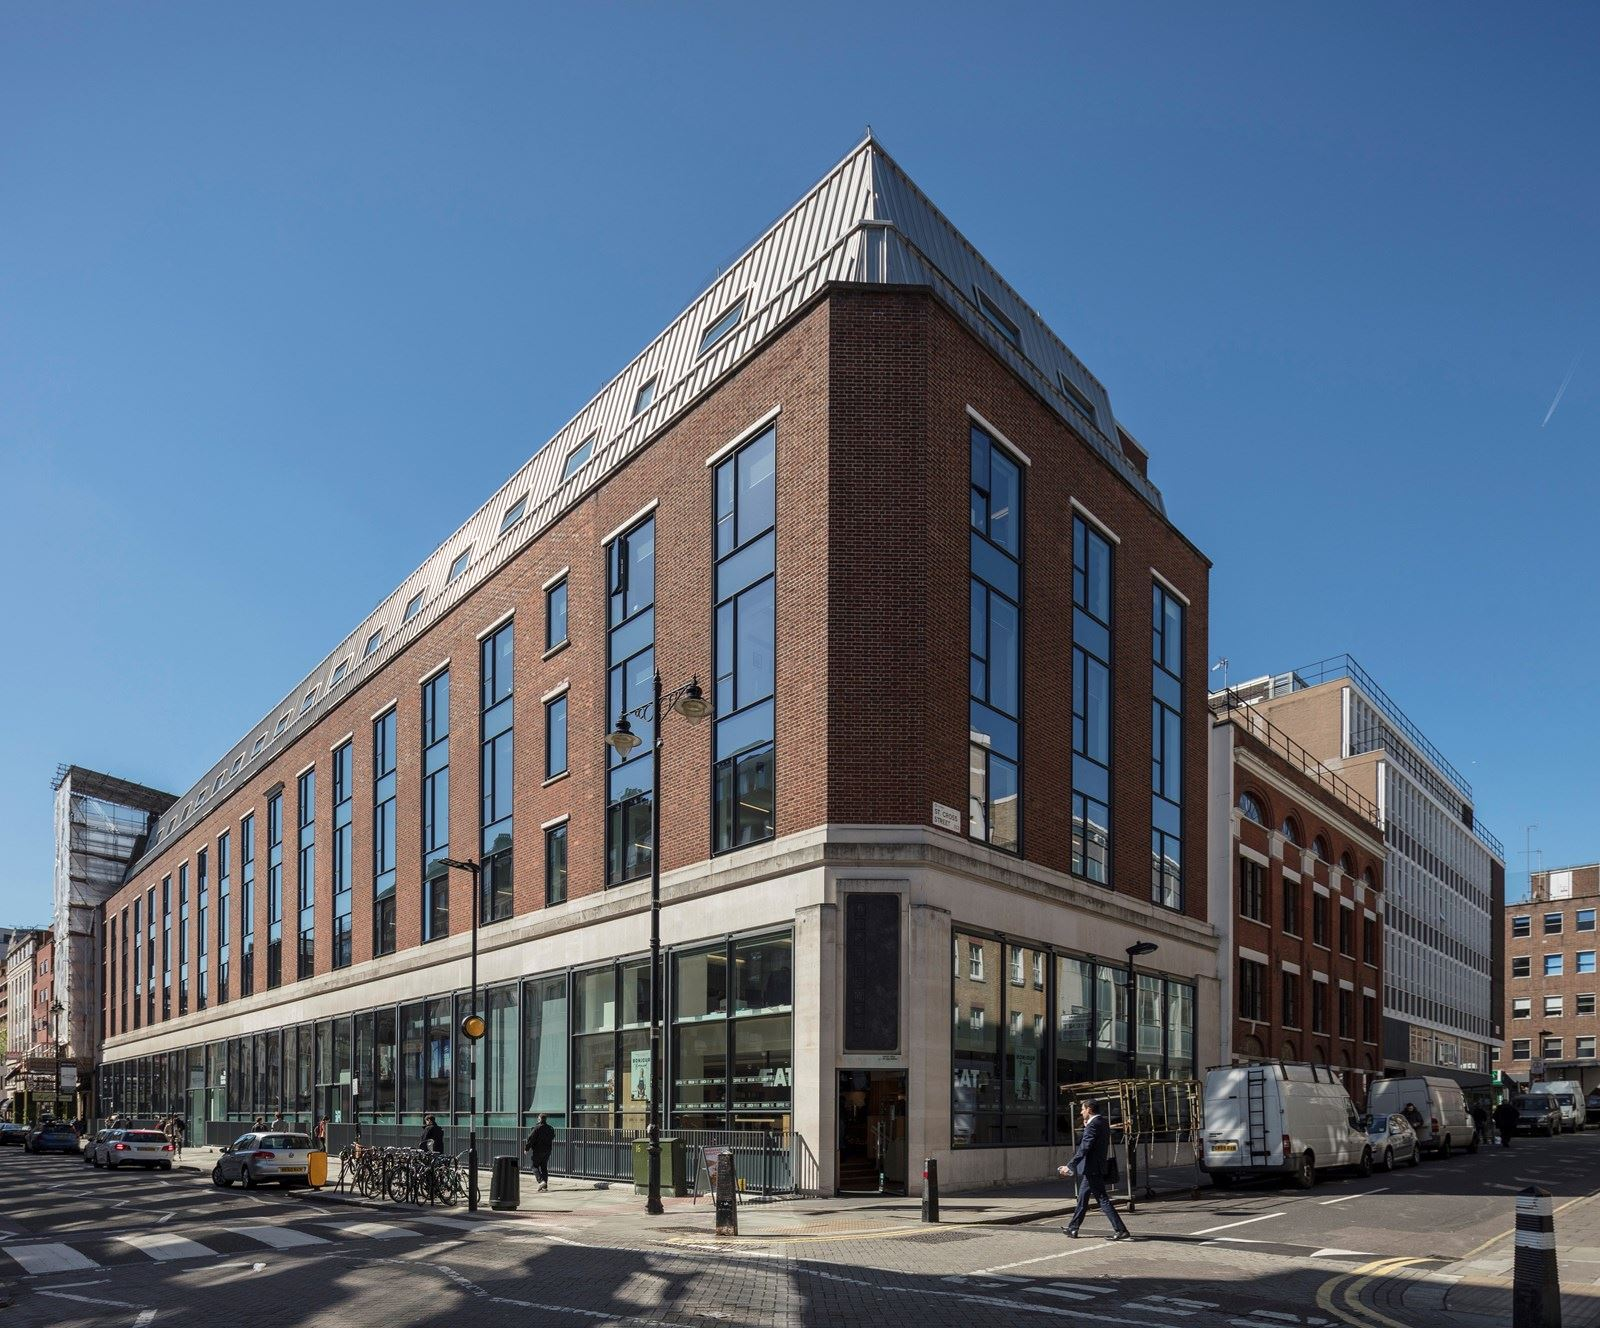 Photo of Johnson Building, 77 Hatton Garden, EC1